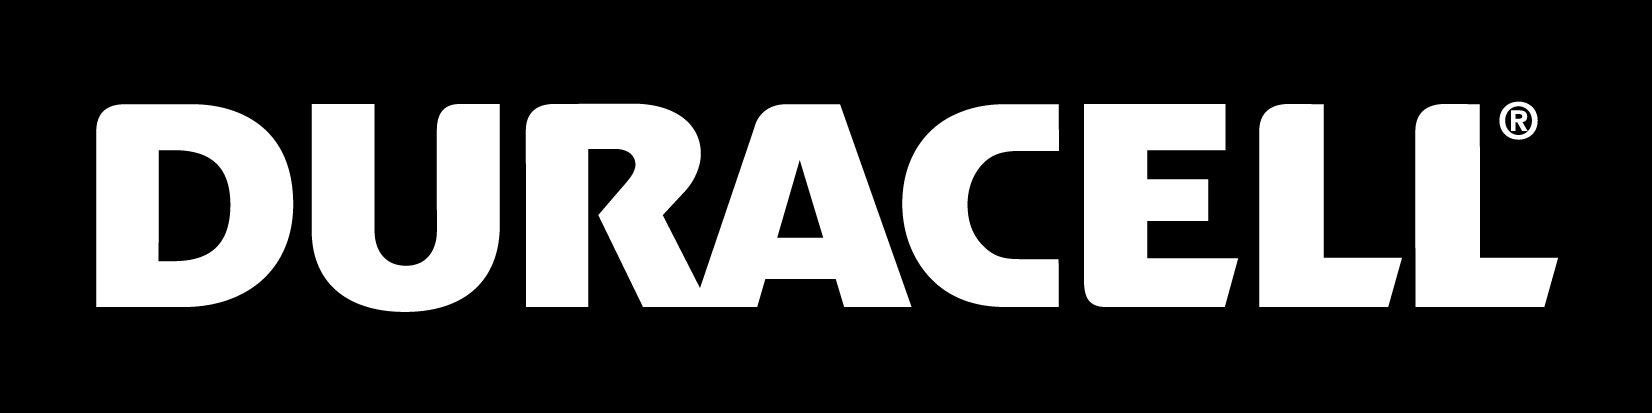 Image result for duracell logo